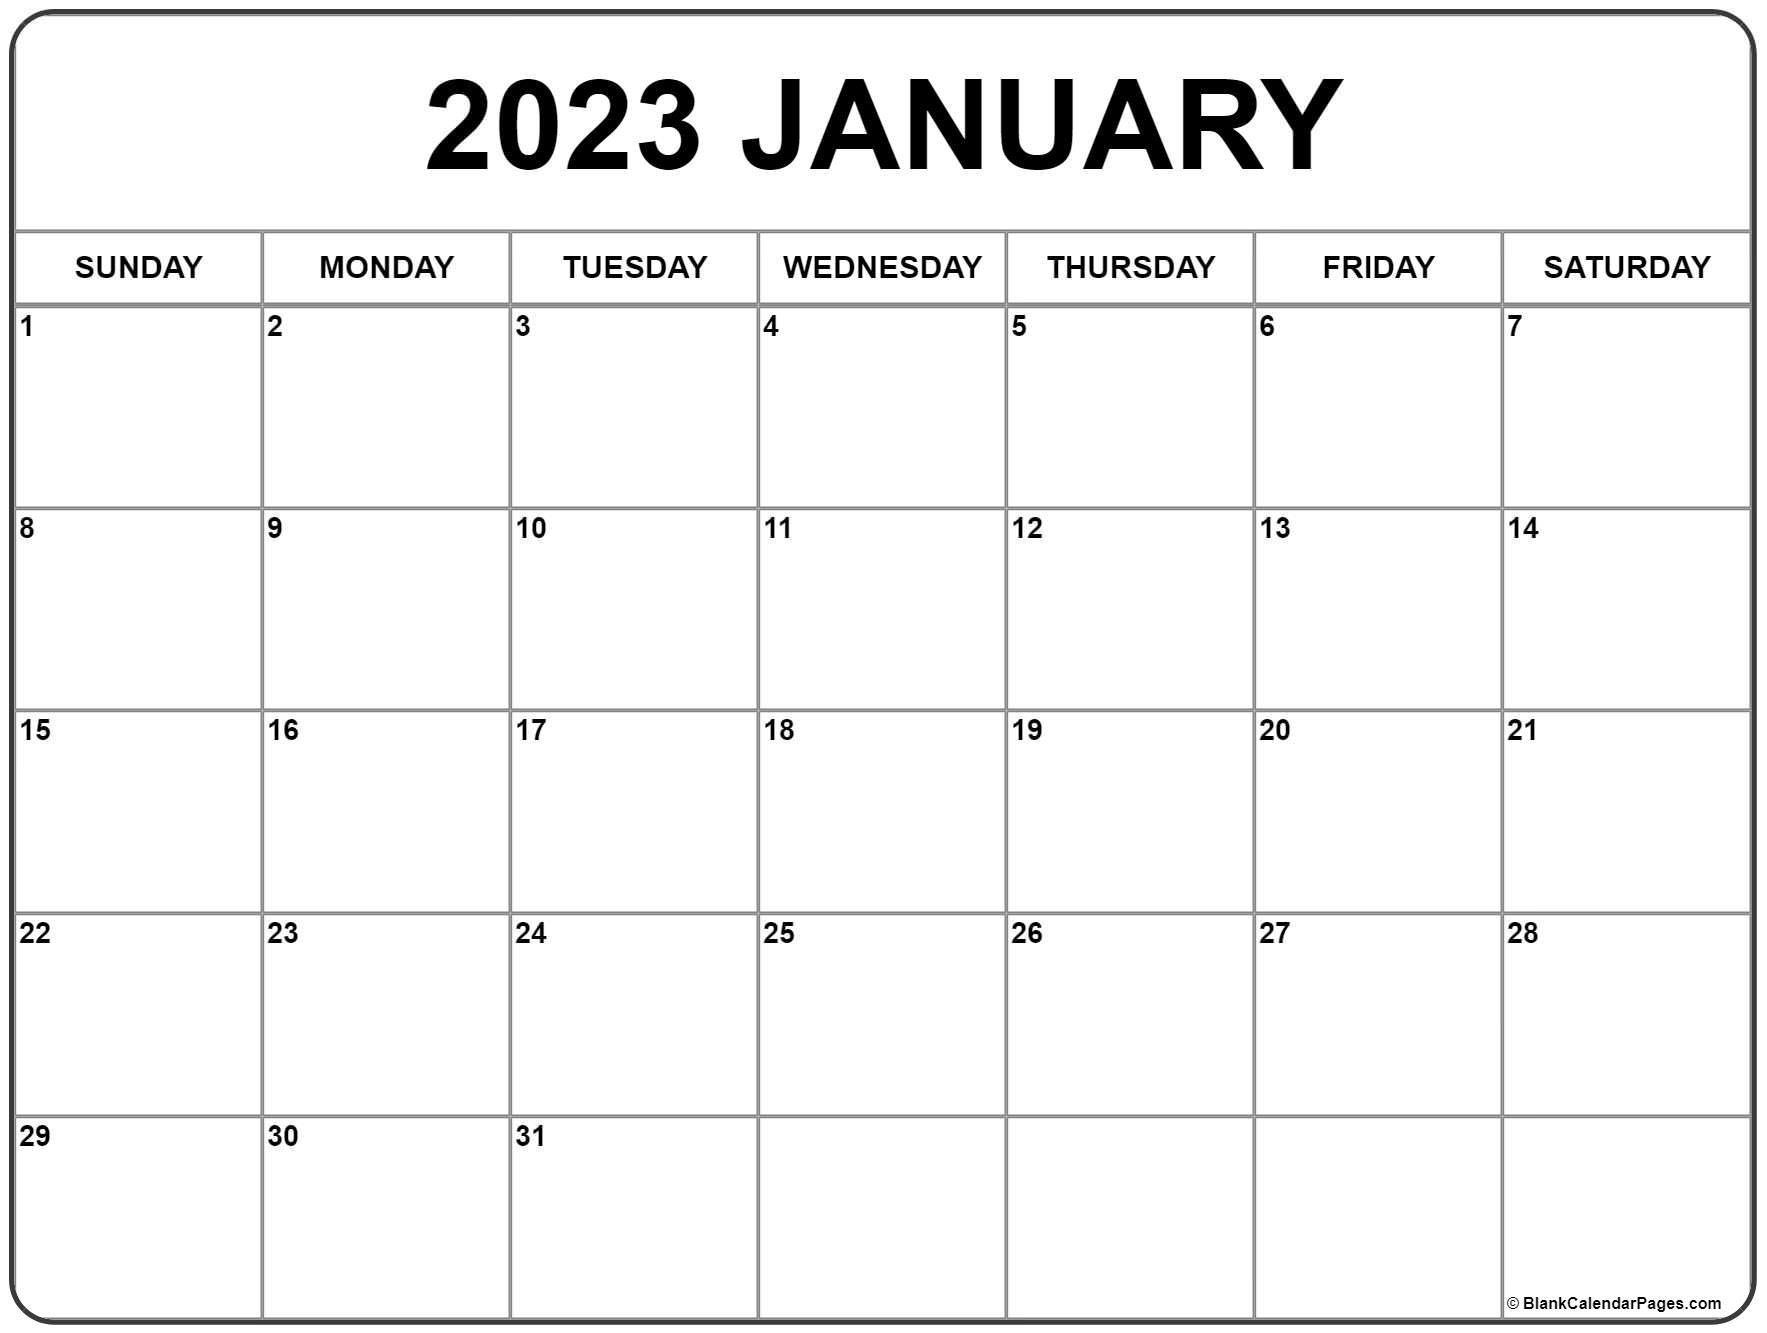 January 2022 calendar | free printable monthly calendars